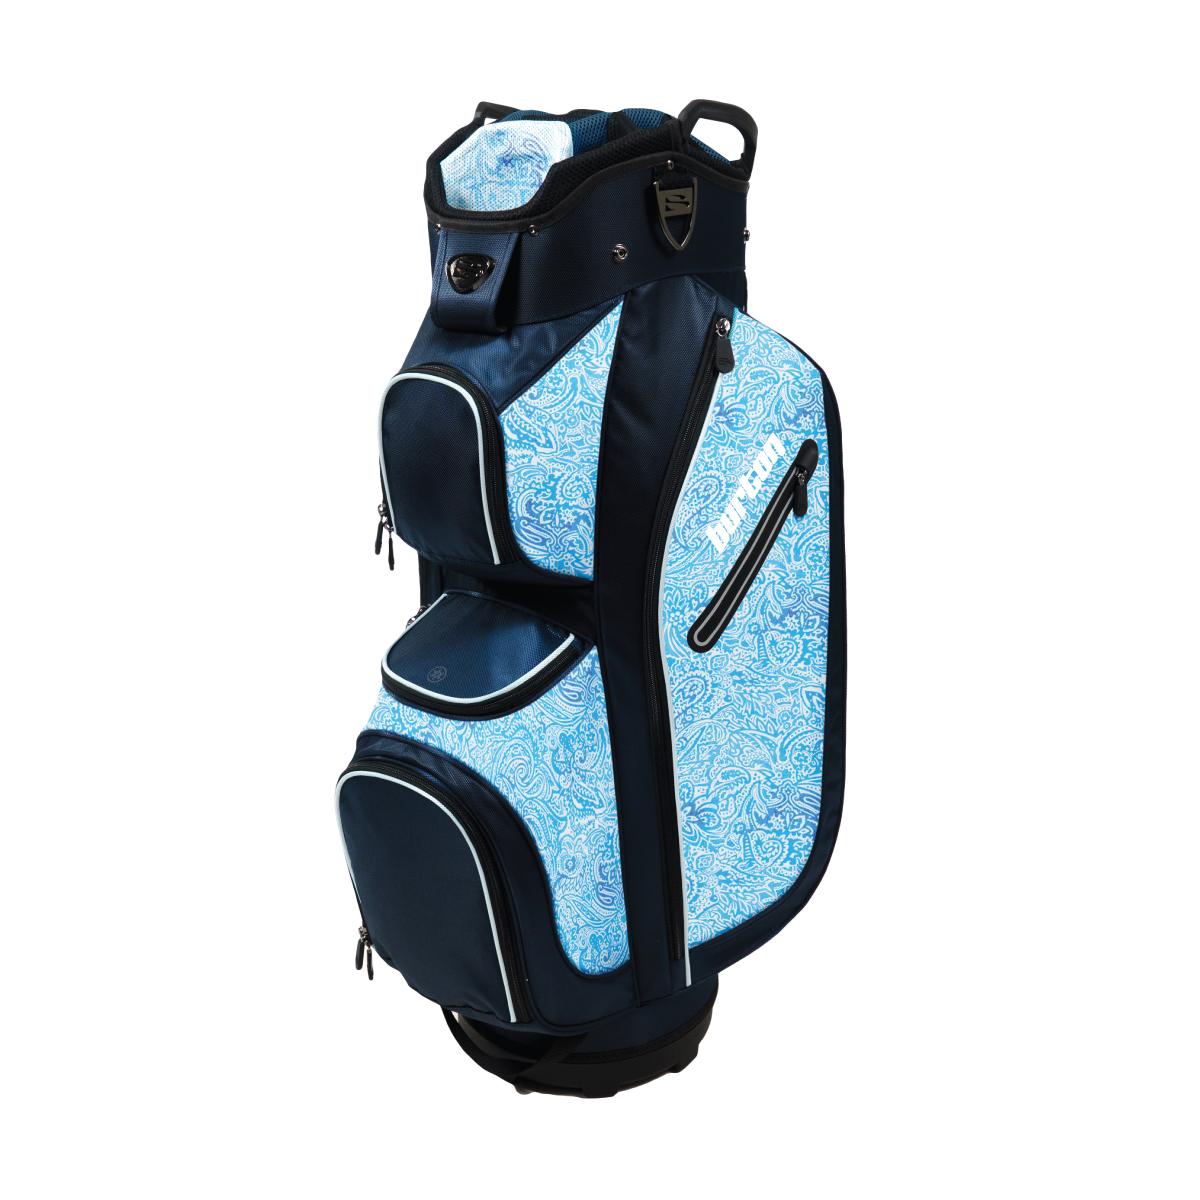 Southwind Apparel Joins Forces with Burton in new Las LDX ... on burton golf bag white, burton executive golf bag, burton golf bags men, burton golf bag logo,